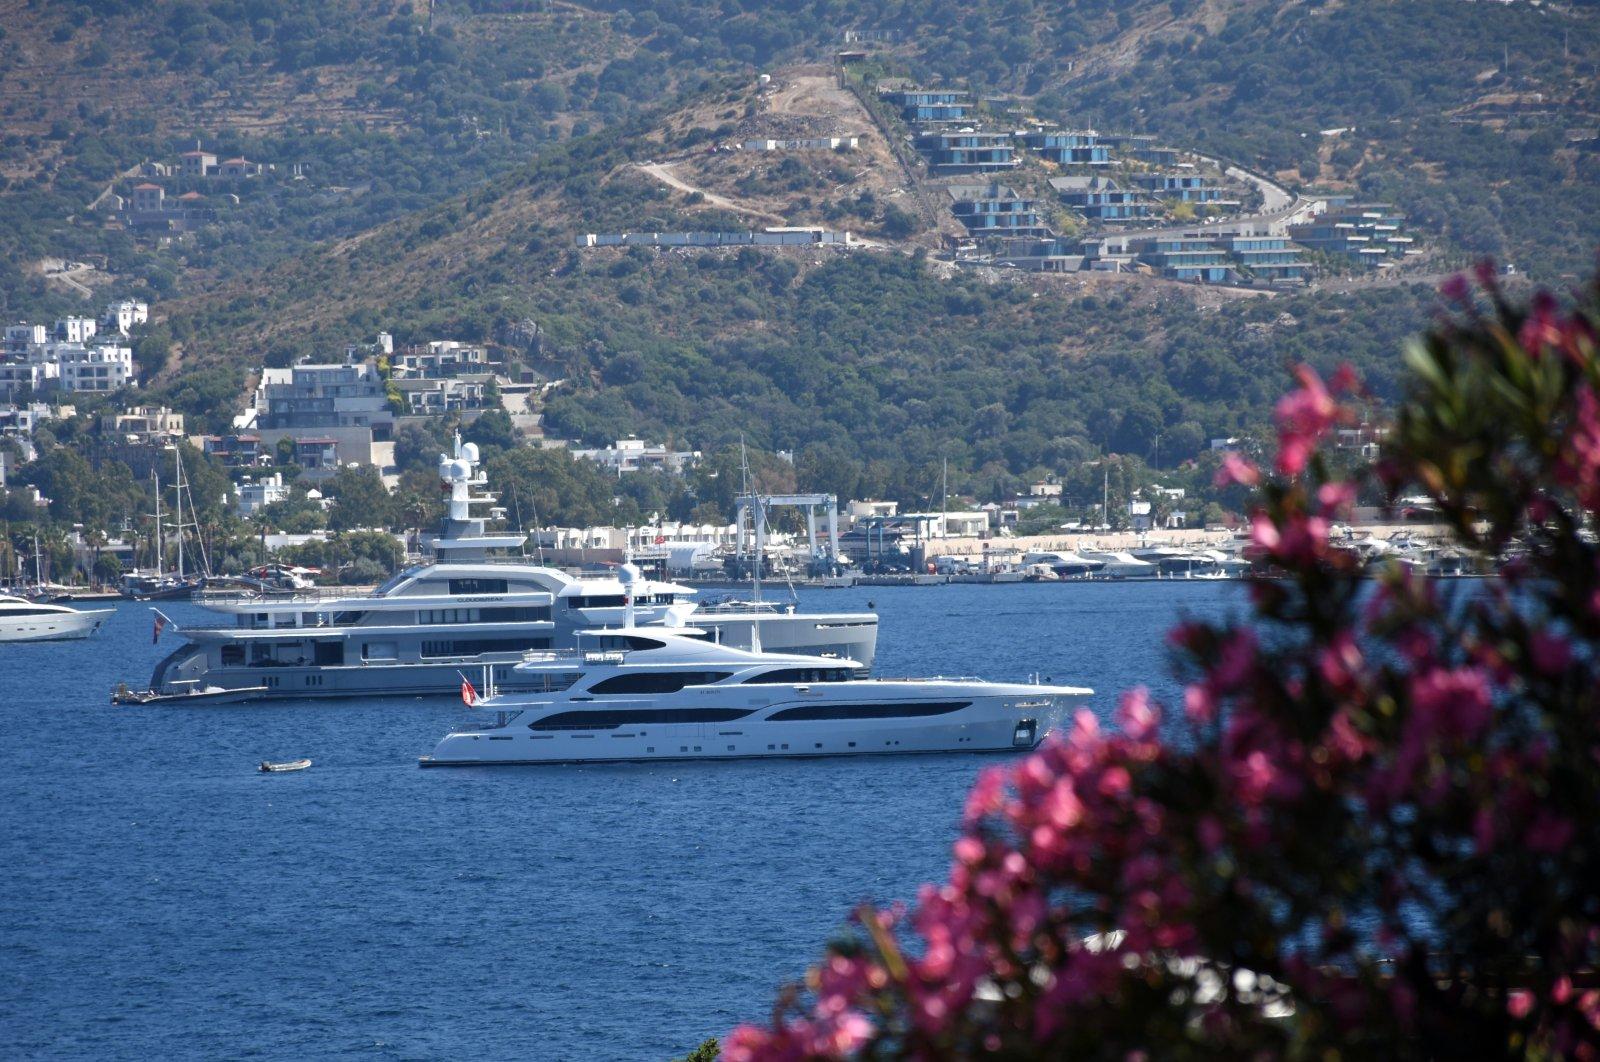 Yachts are seen in Turkey's touristic Muğla province, June 29, 2020. (AA Photo)